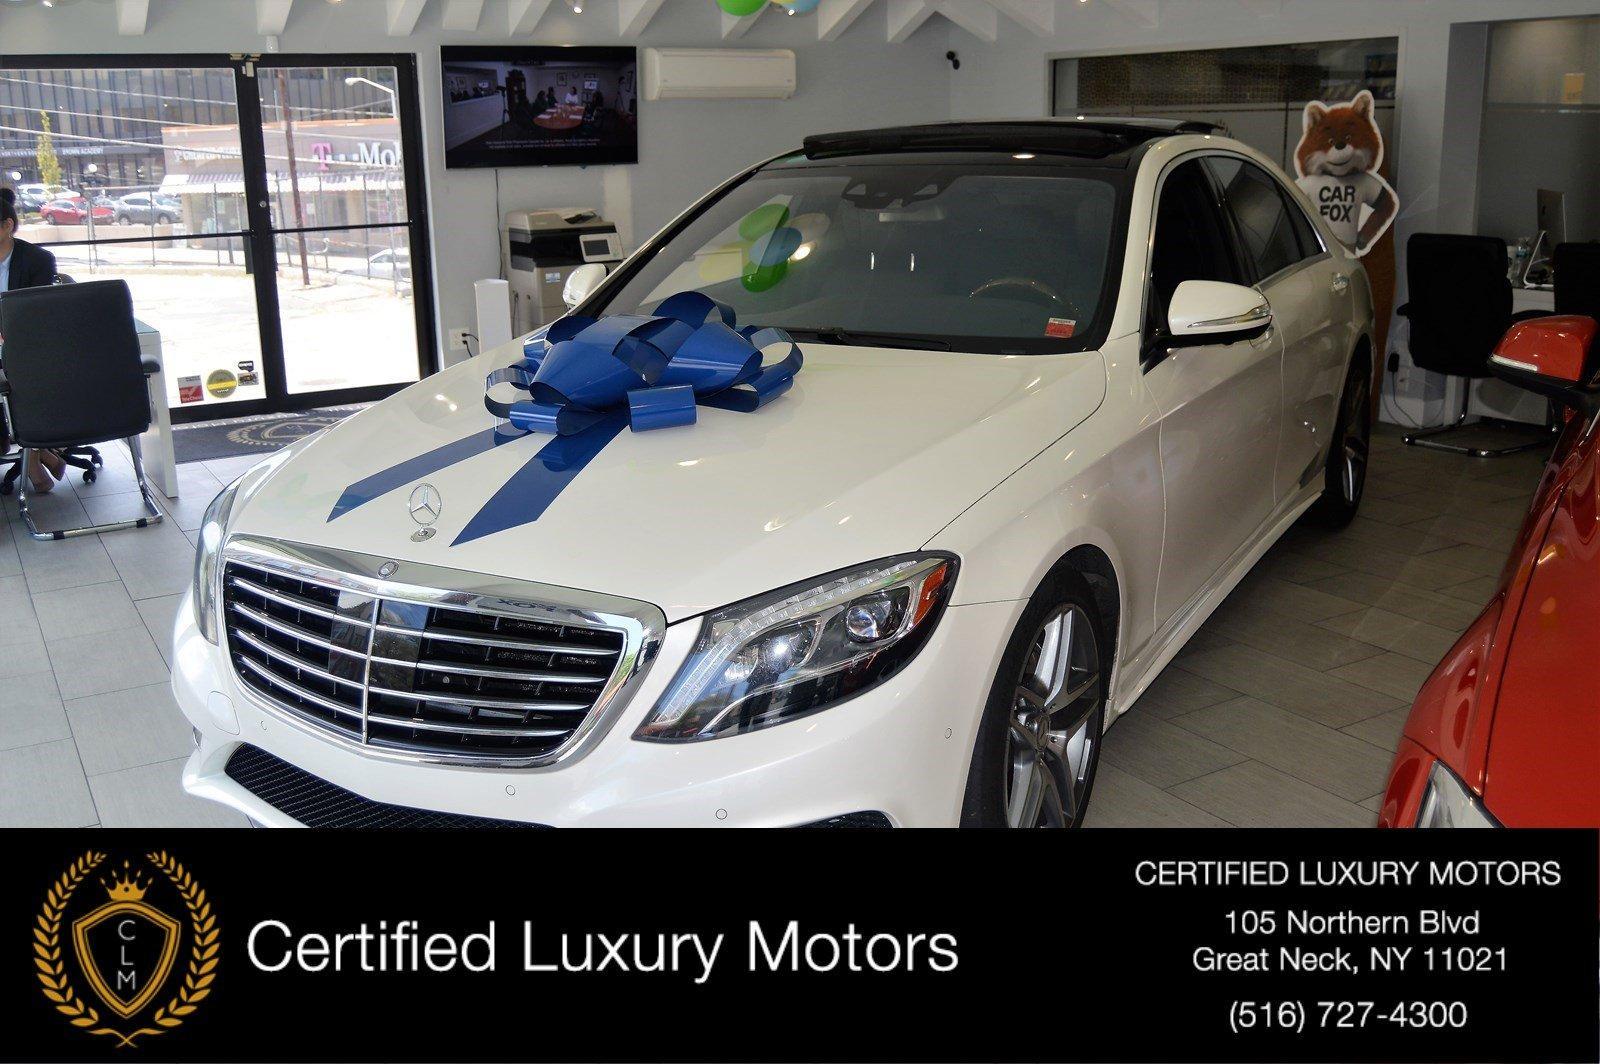 https://www.certifiedluxurymotors.com/imagetag/554/main/l/Used-2014-Honda-Accord-Sedan-Sport.jpg